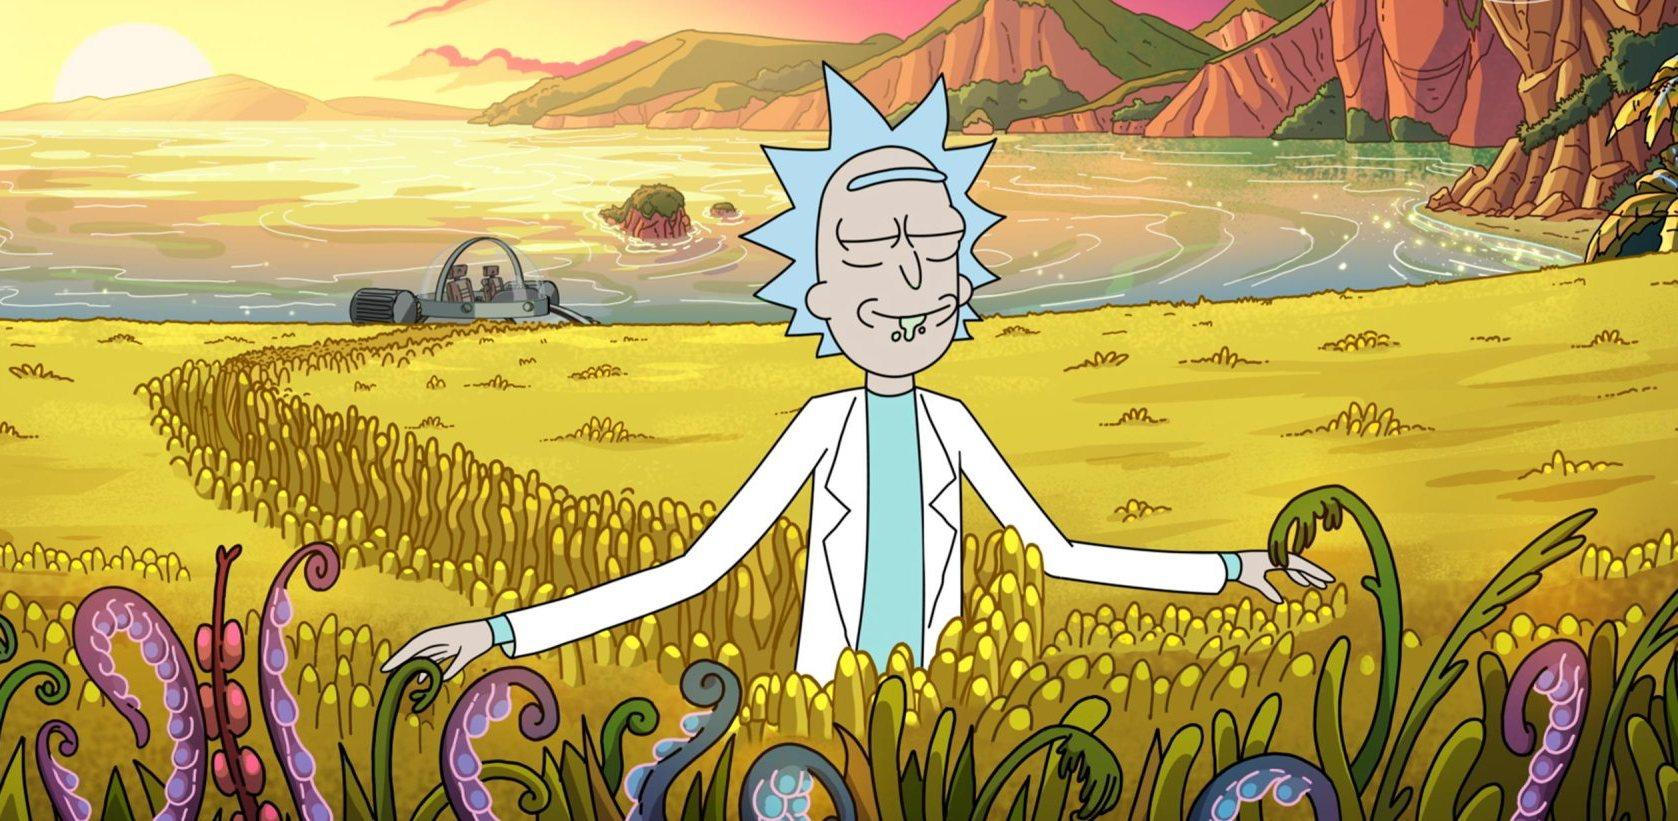 Rick And Morty Season 4 Hd Wallpapers Wallpaper Cave